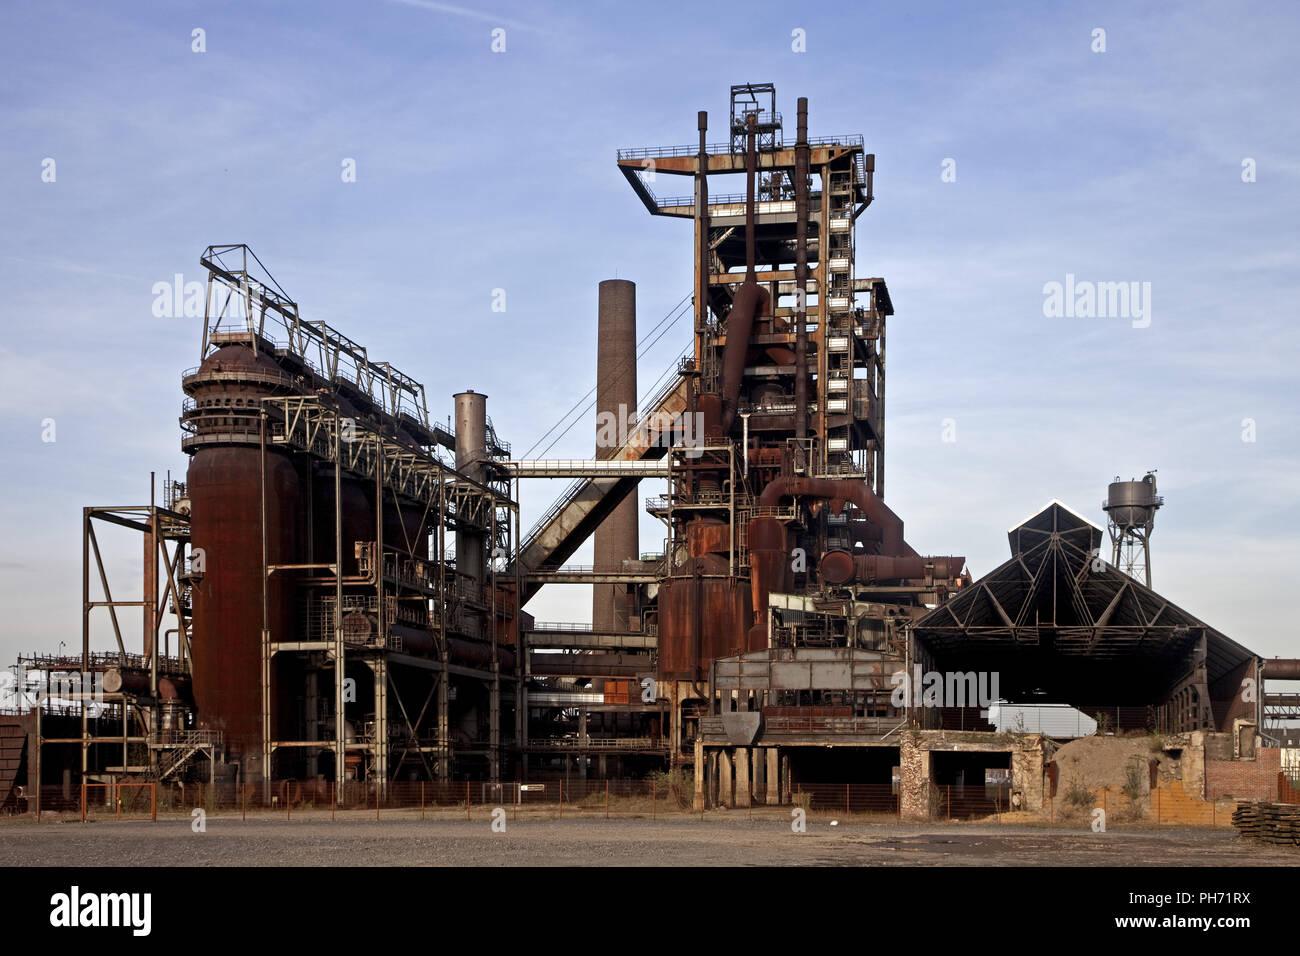 Blast furnace 5, Phoenix West, Dortmund, Germany. - Stock Image